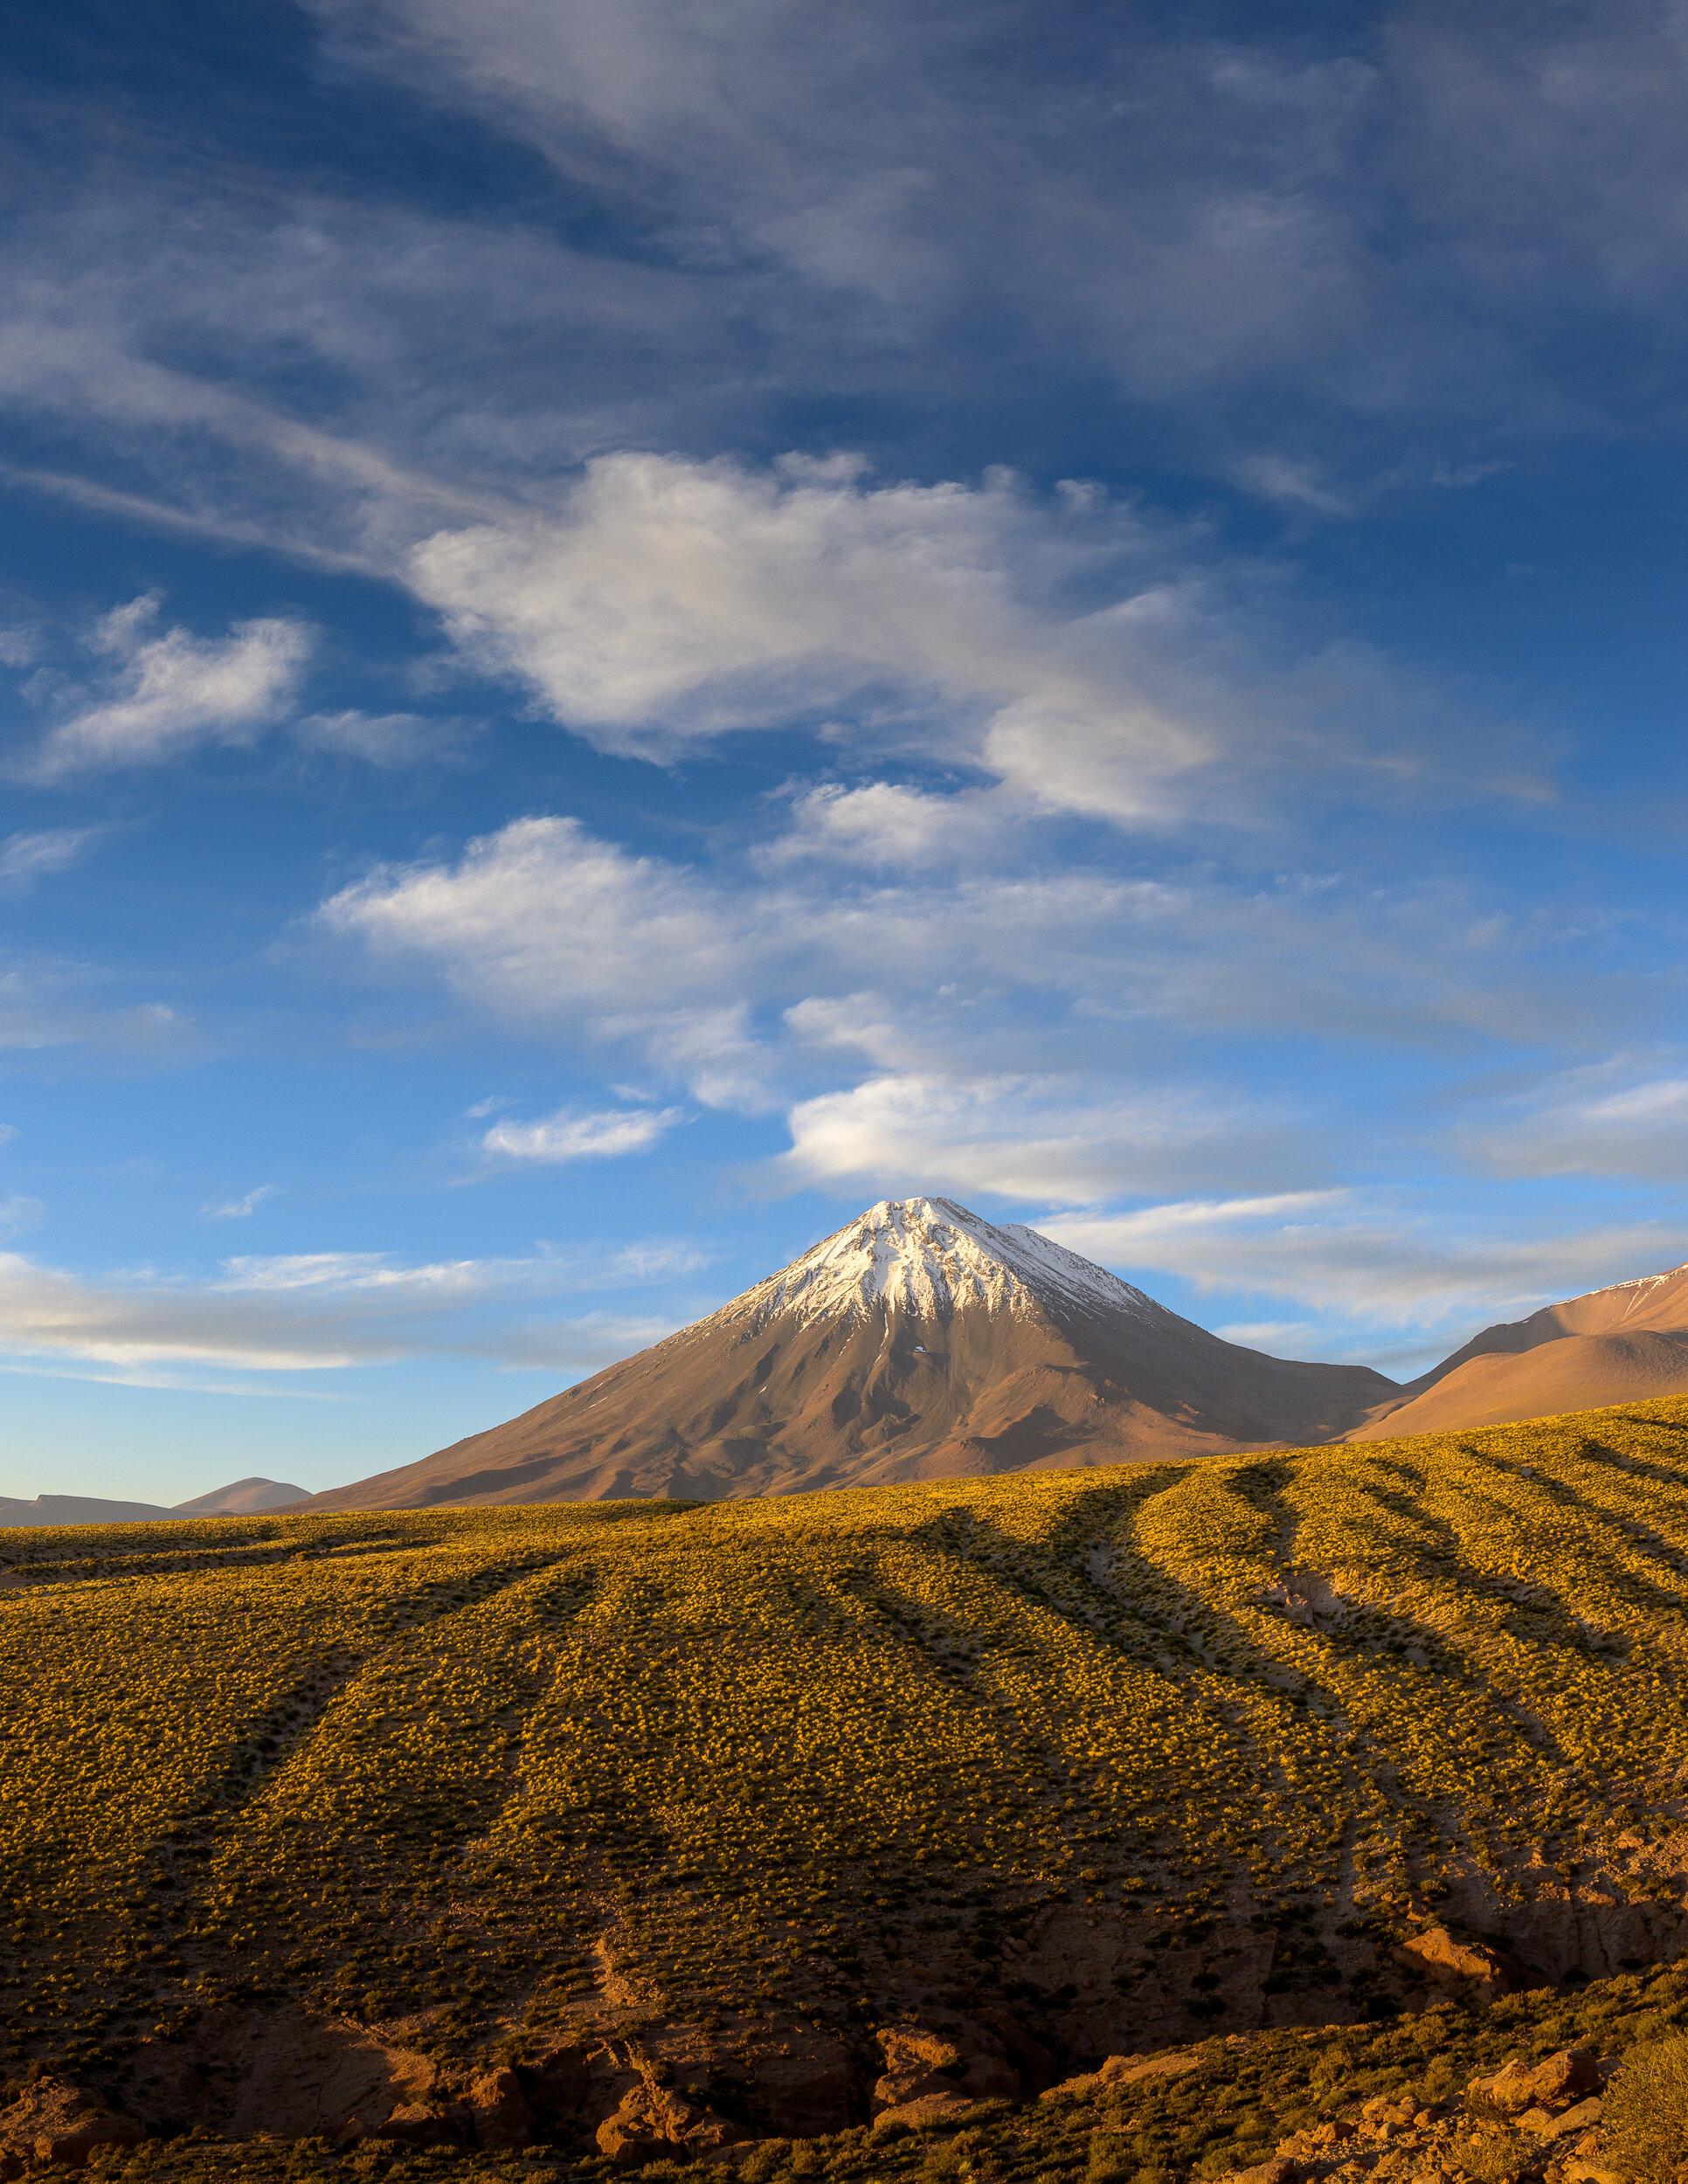 Atacama-5532-Pano.jpg